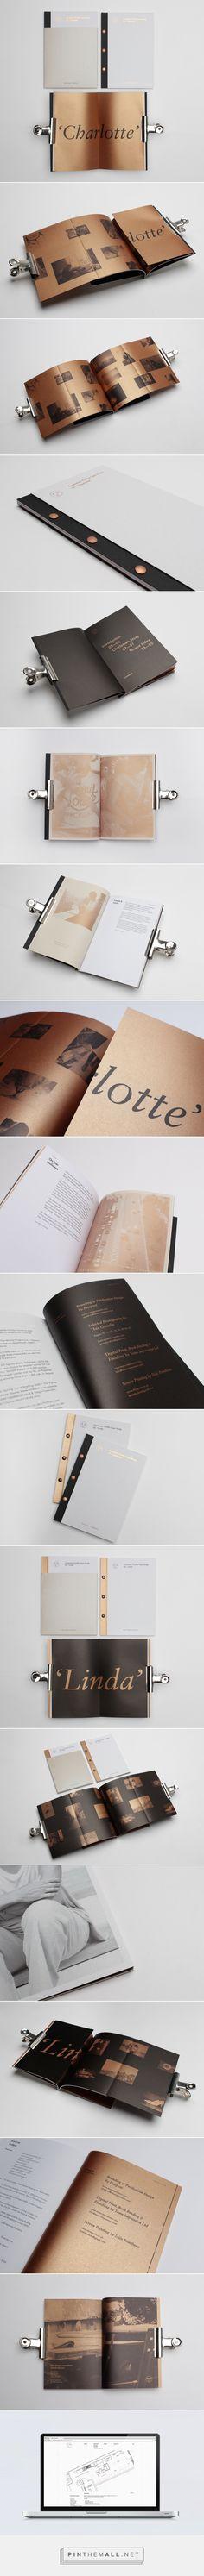 Pure Design Consultancy by Passport Design Bureau